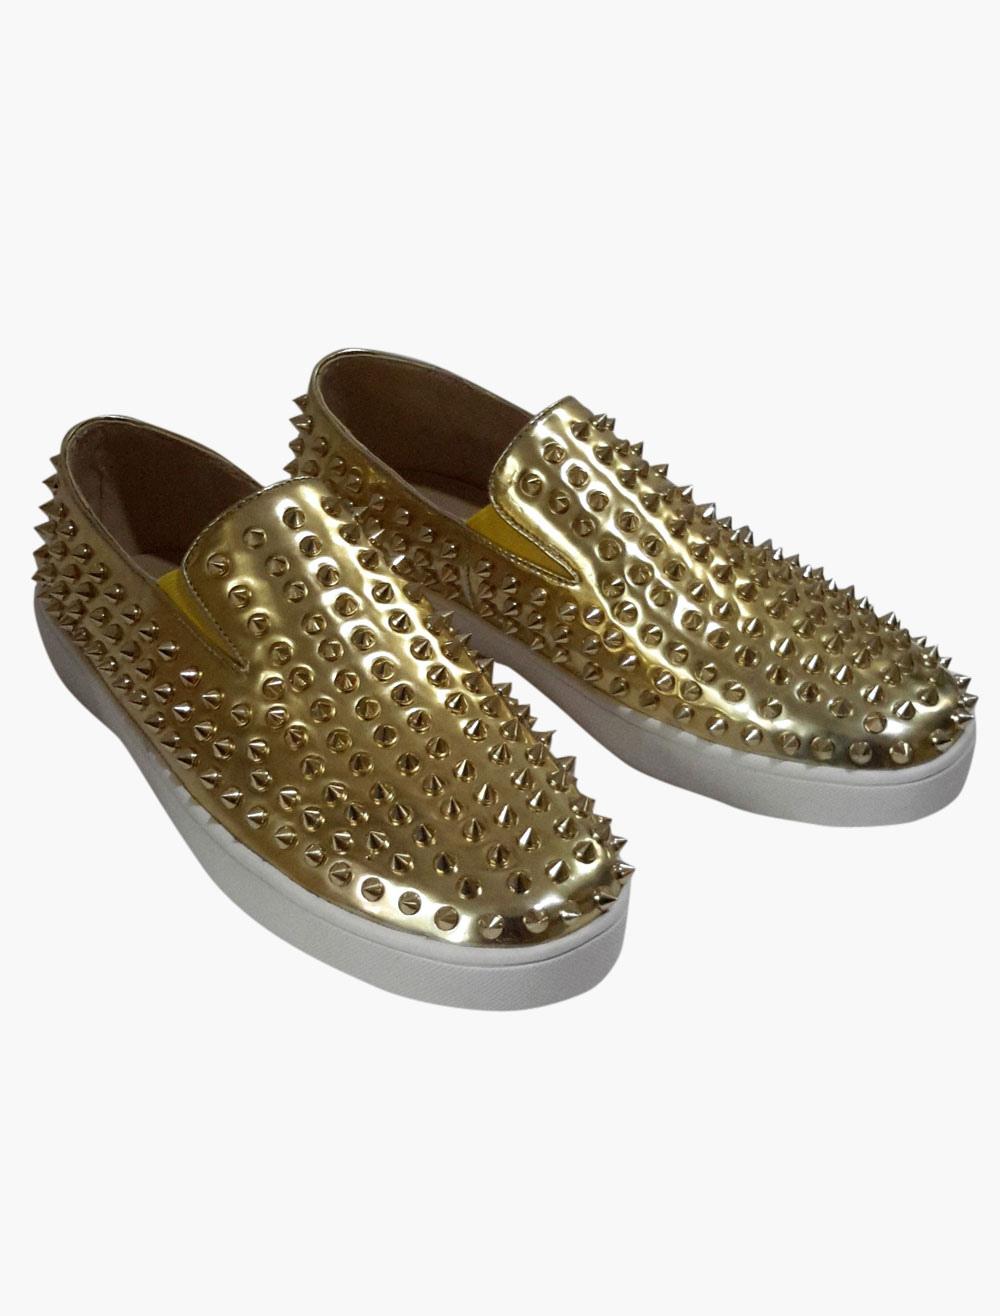 Monogram Suede Rivets Soft Sole Mens Loafer Shoes photo